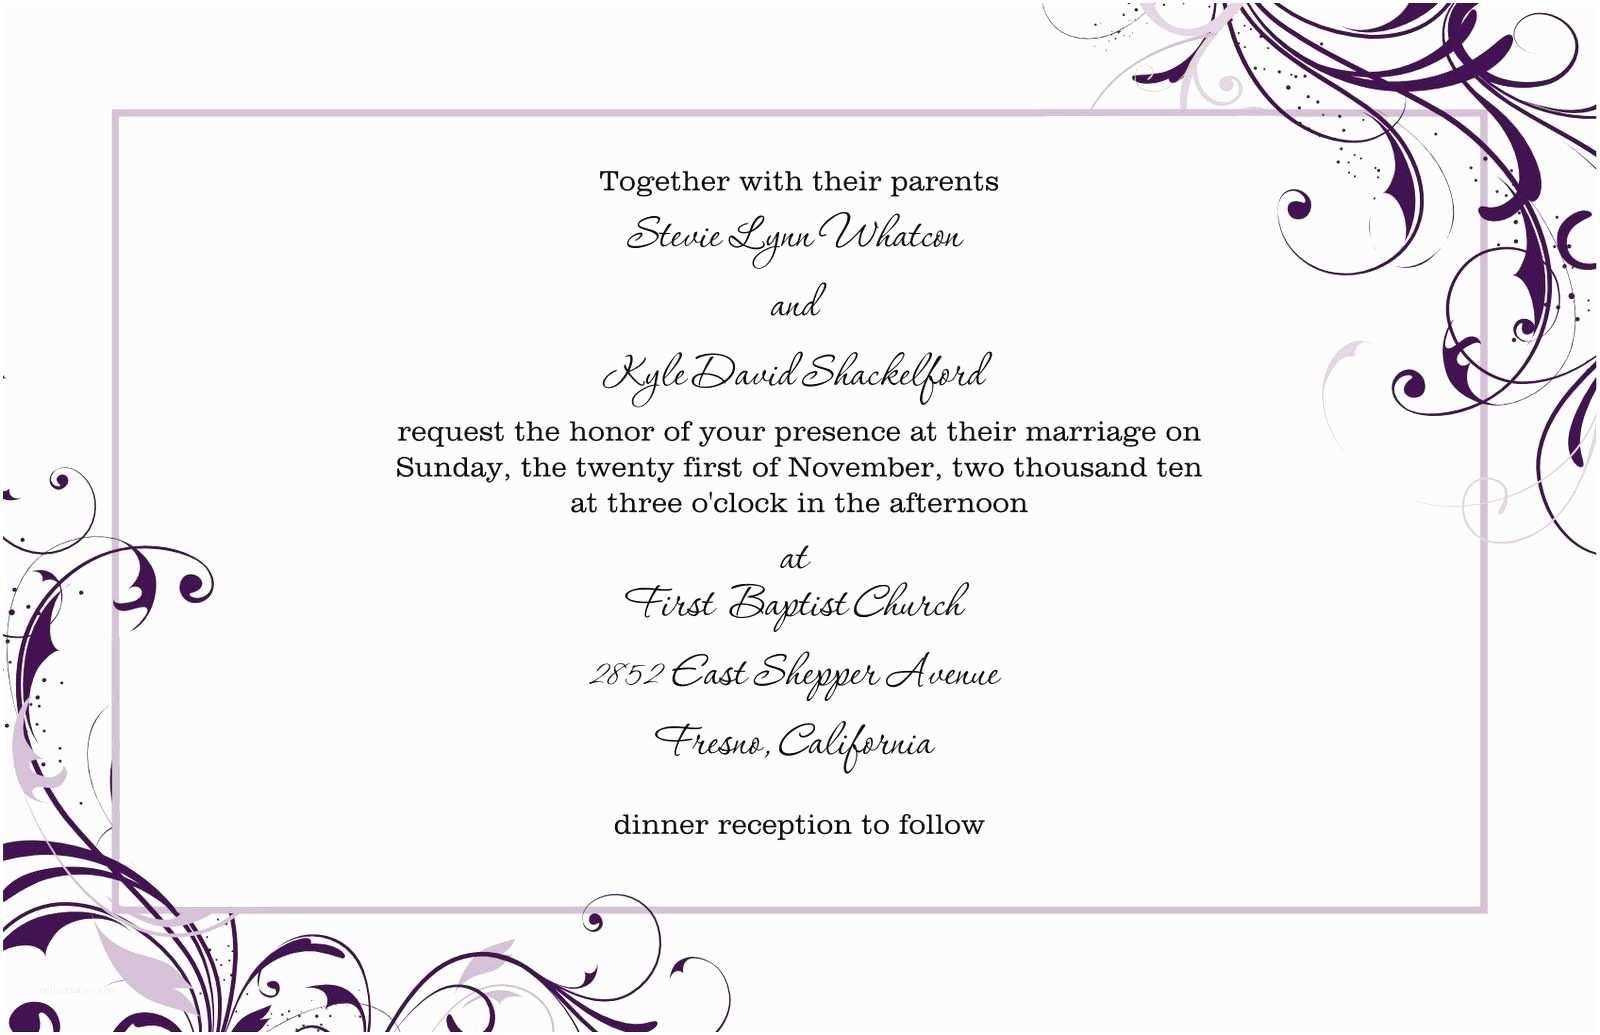 Free Wedding Shower Invitation Templates Free Blank Wedding Invitation Templates for Microsoft Word